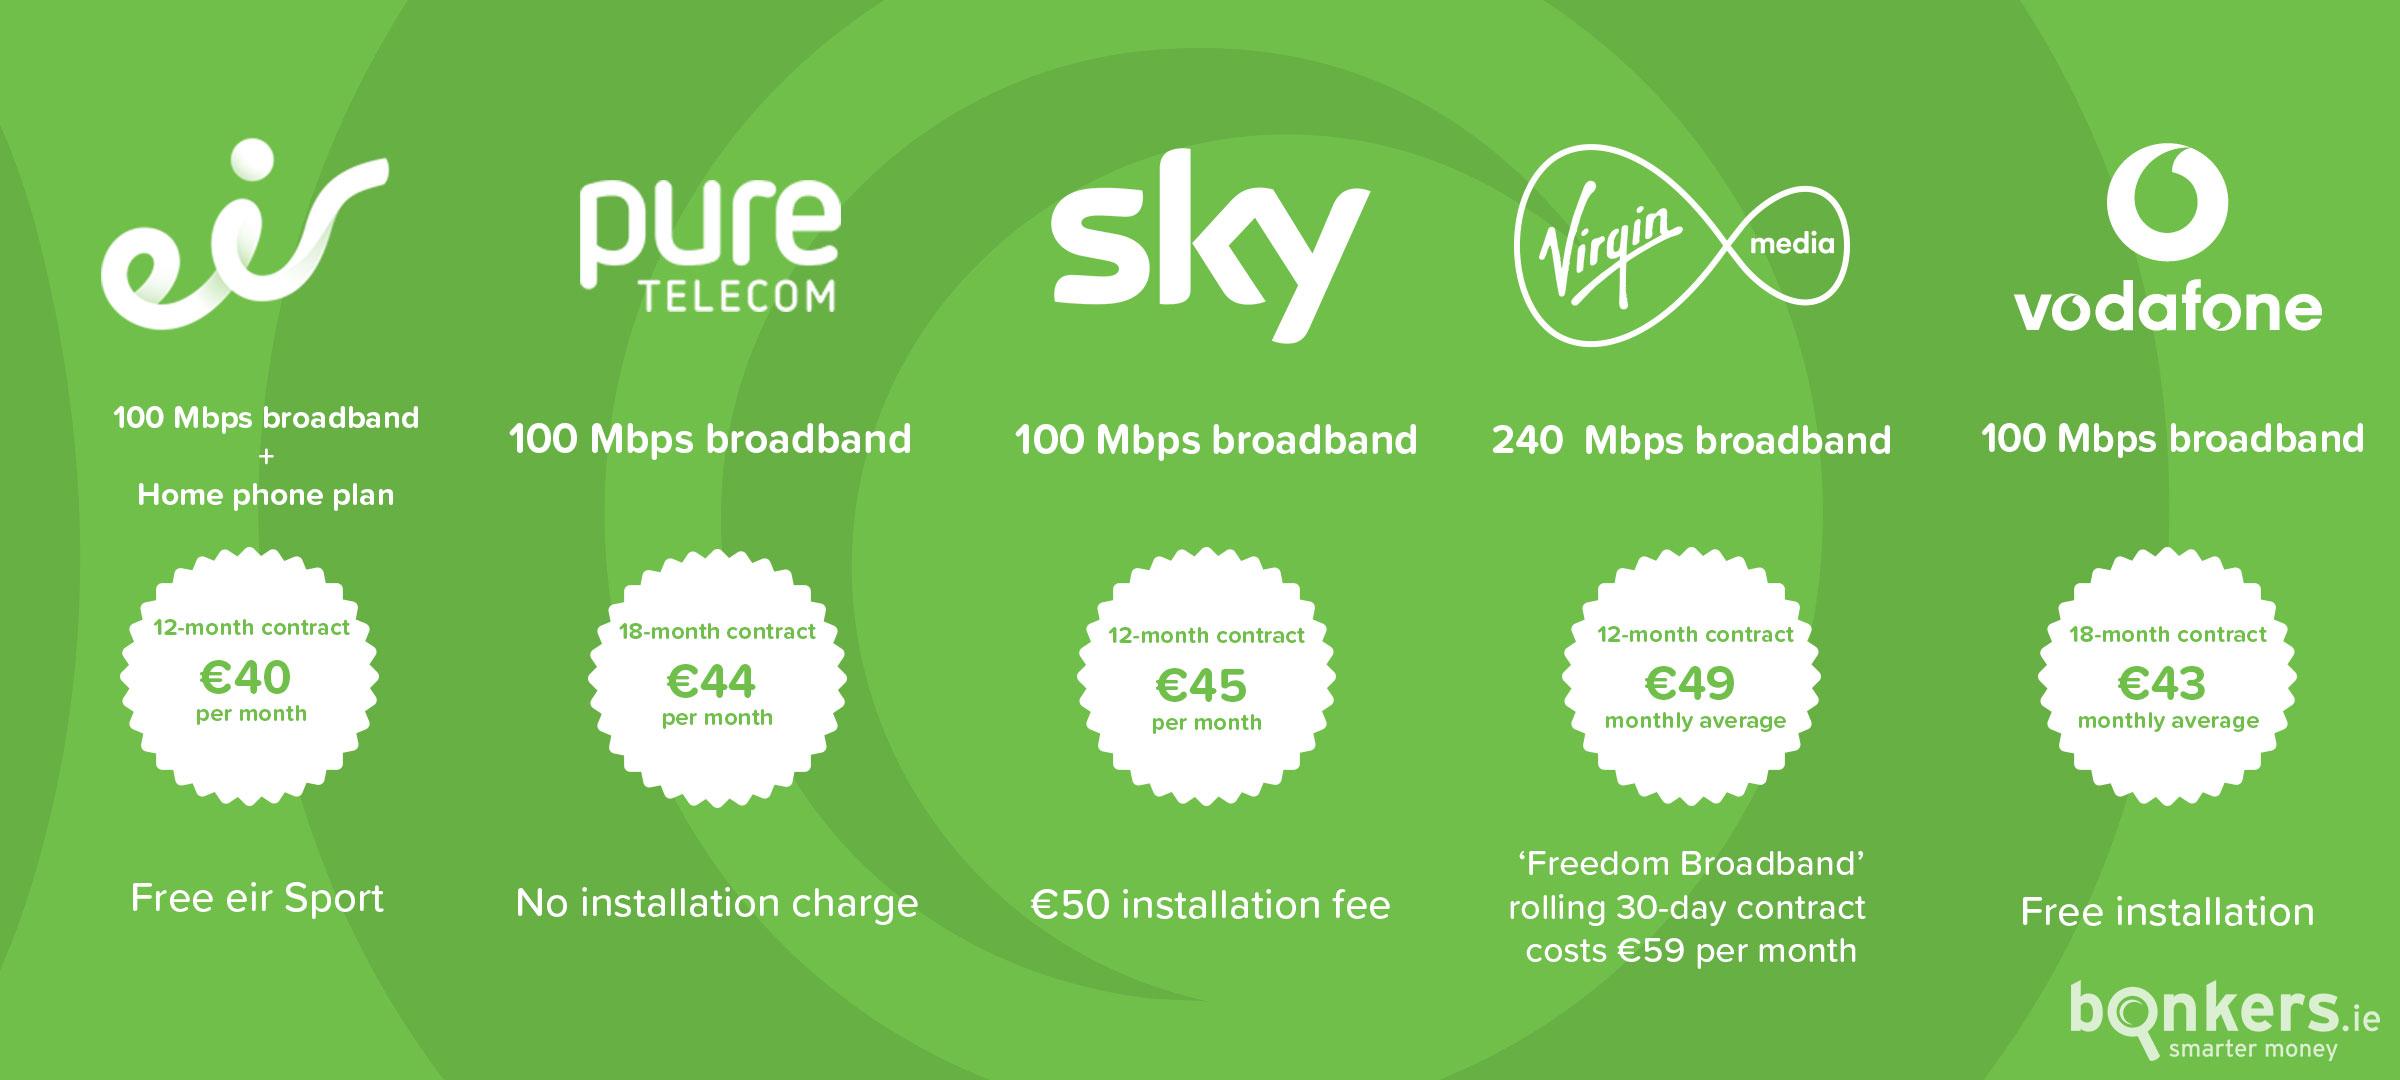 Naked broadband deals